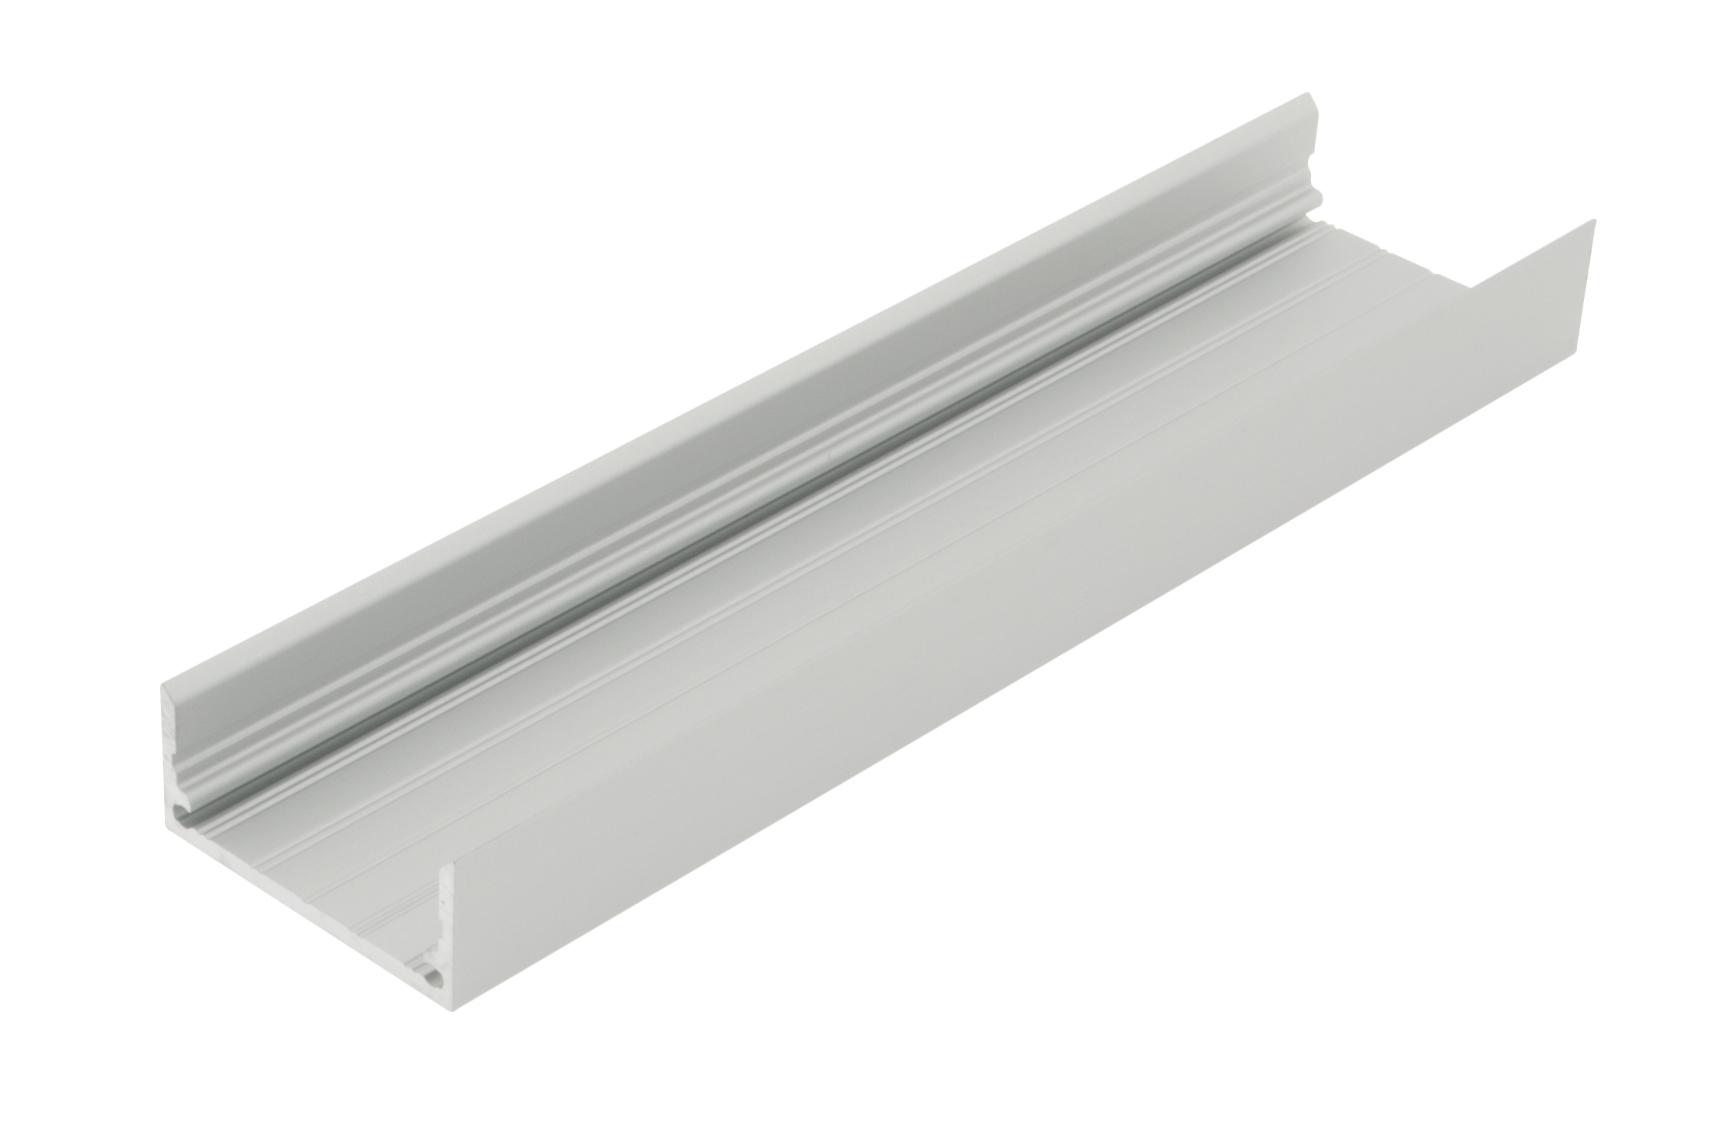 1 m Aluminium Profil CLF LIAP006001